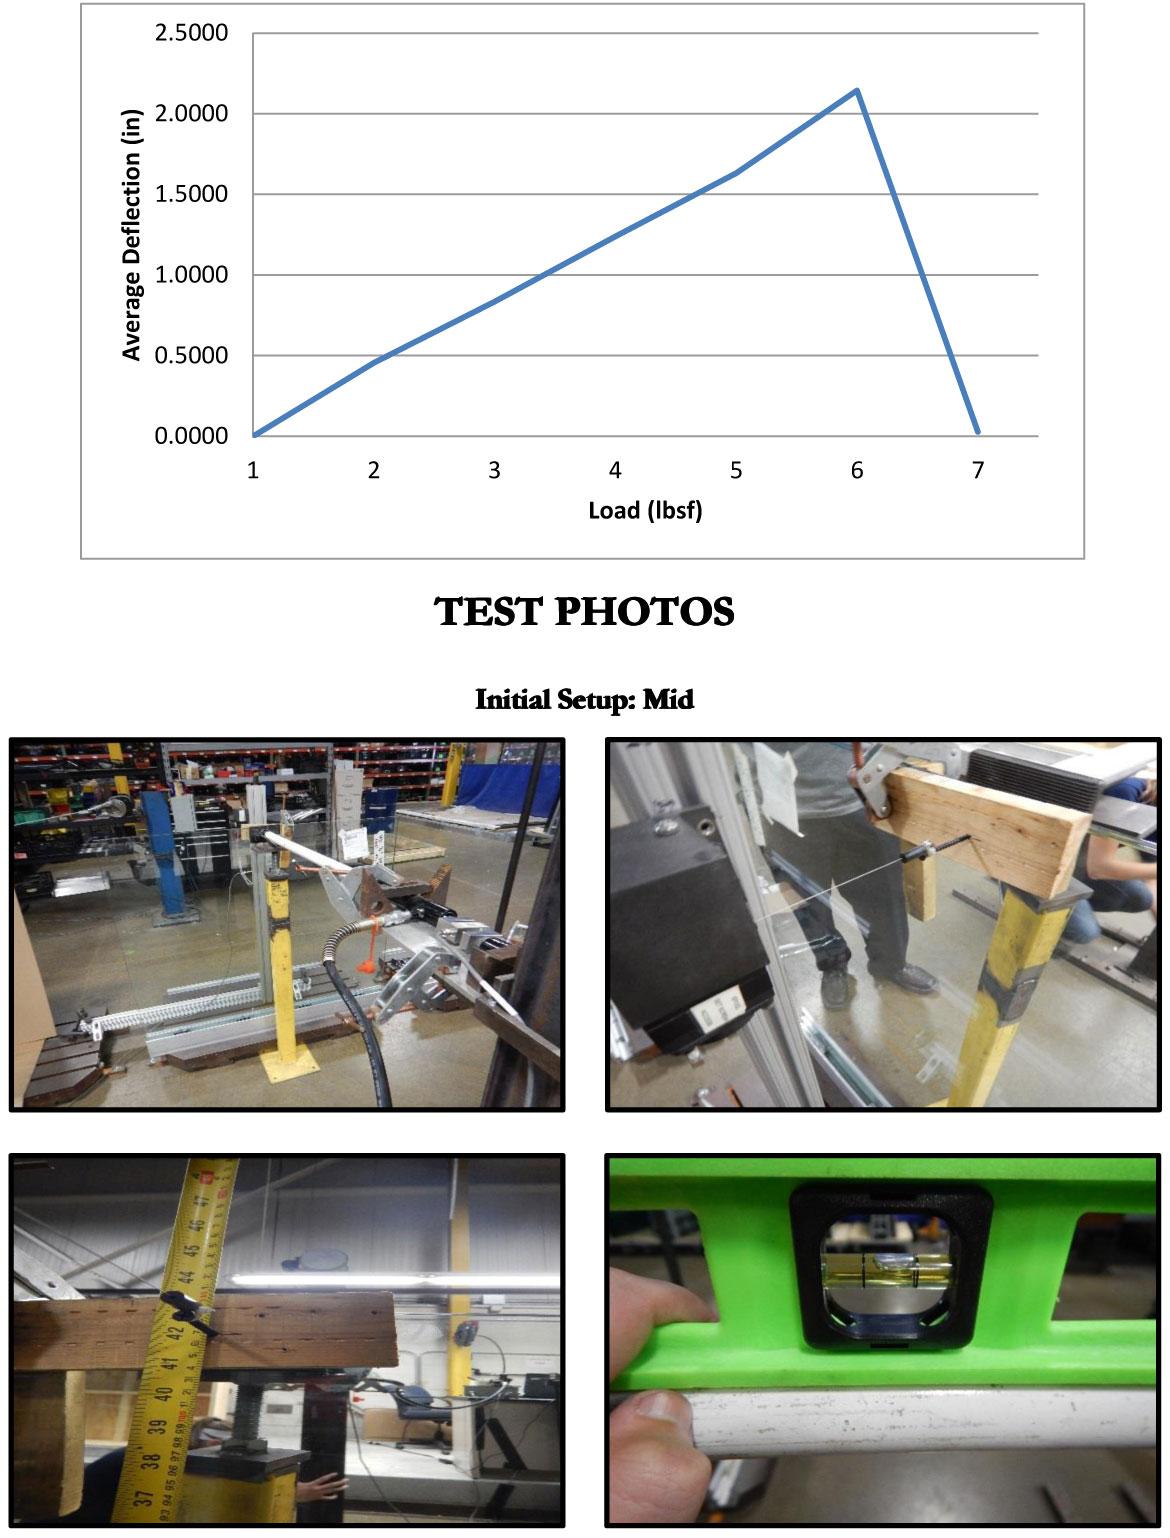 tr002-11-0.5-sgp-astme985-deflectiontest.jpg